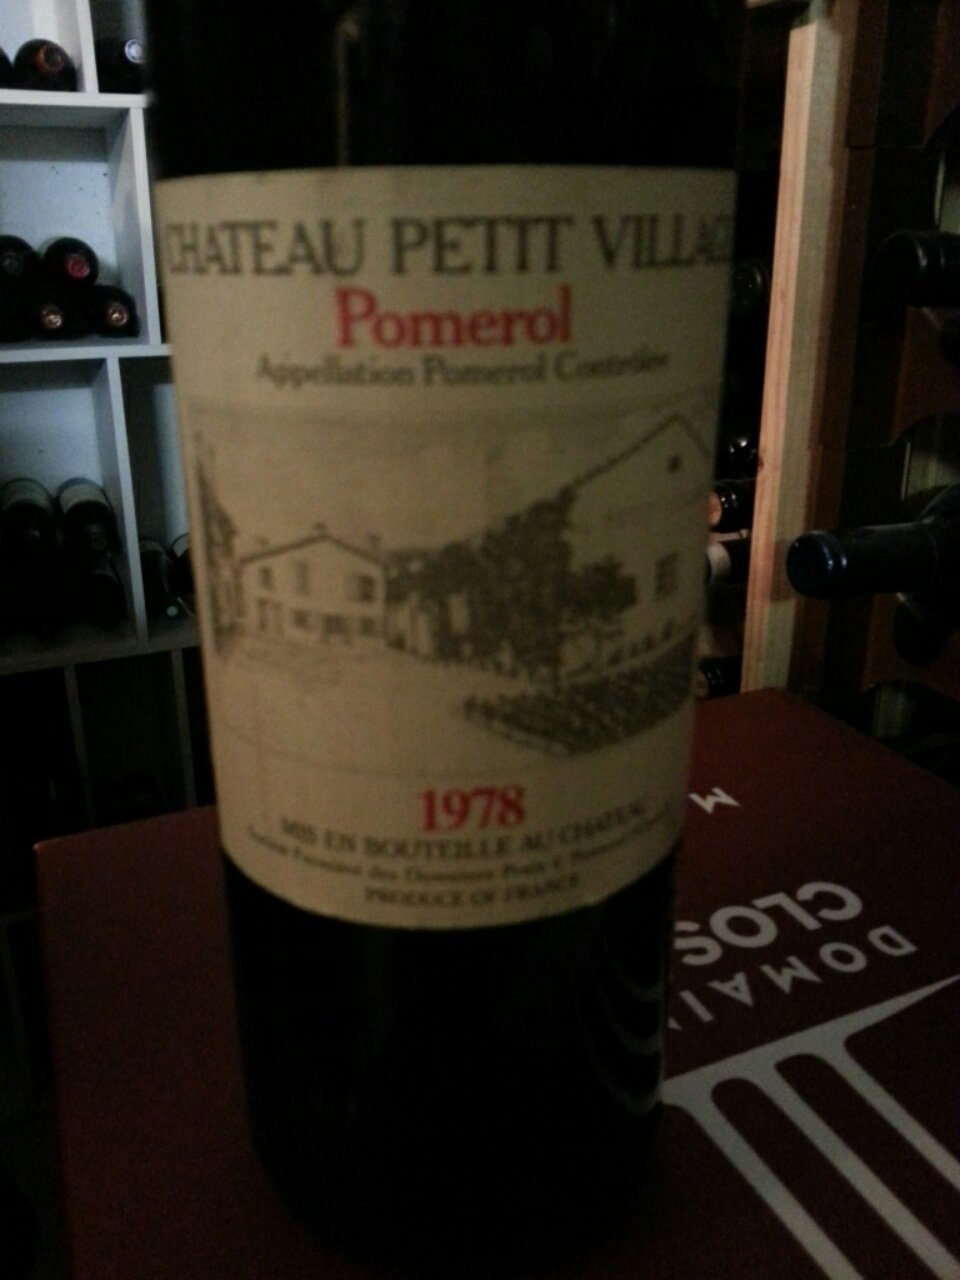 ch teau petit village pomerol 1978 wine info. Black Bedroom Furniture Sets. Home Design Ideas